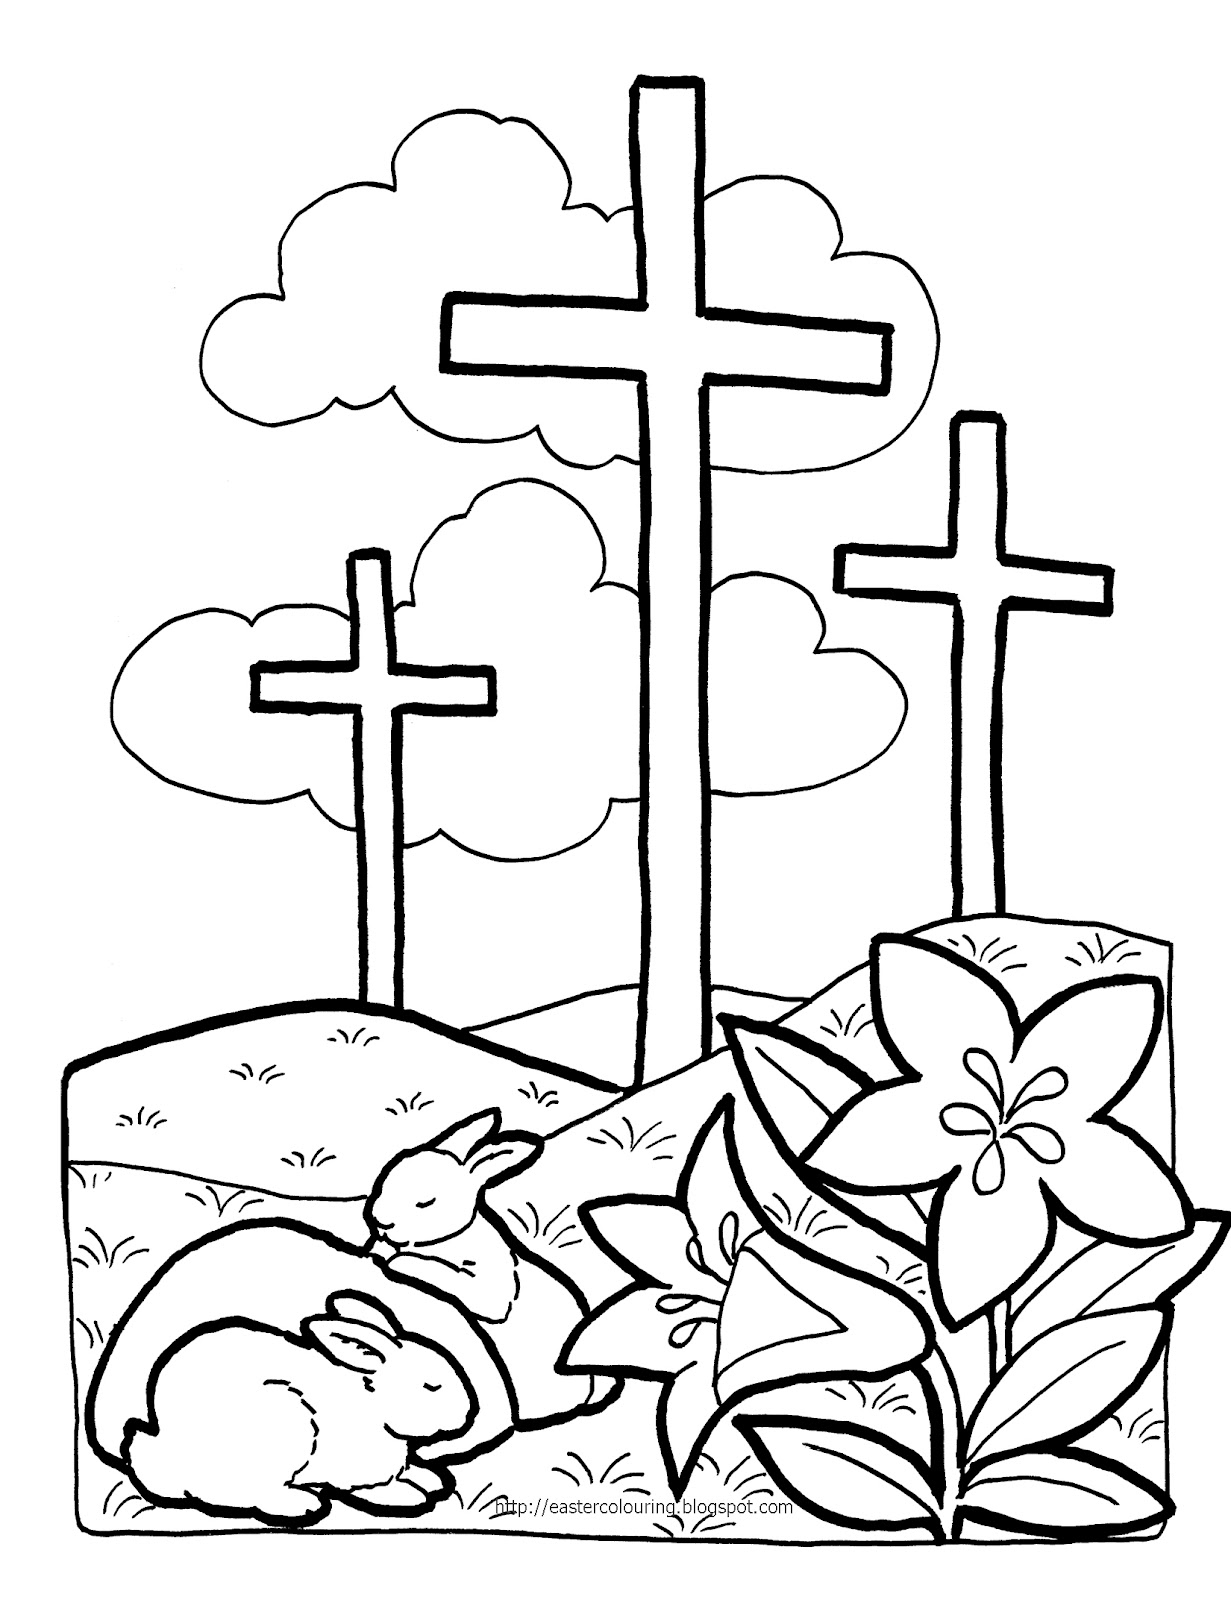 Black And White Religious Clip Art Easter Sunday - ClipArt ... Religious Easter Clip Art Black And White